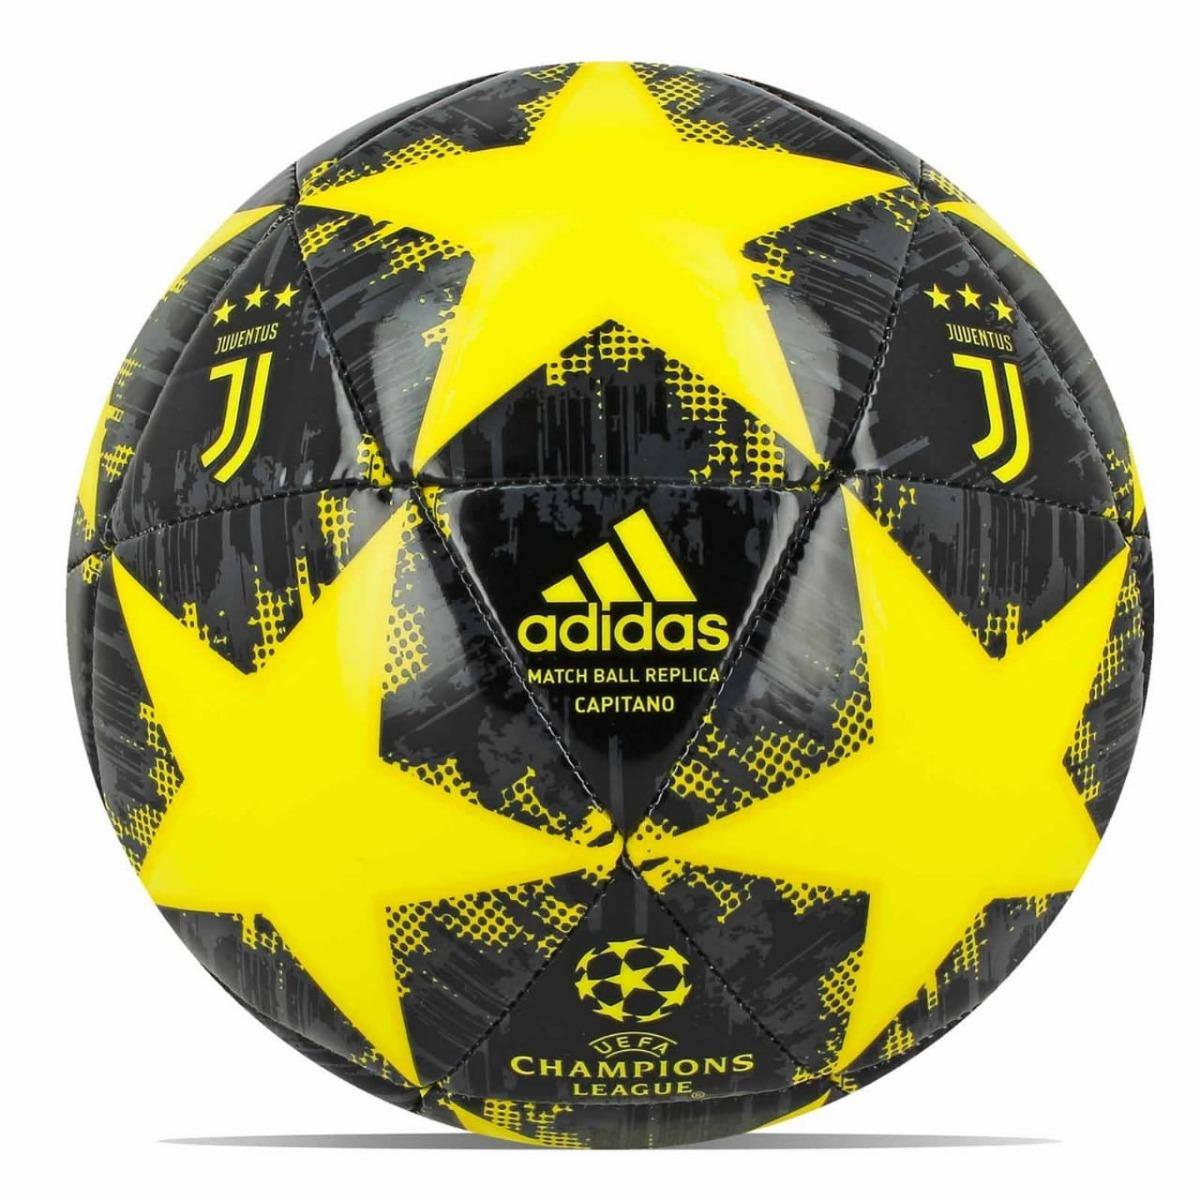 39ecbbc36fd59 balón champions juventus capitano finale 18 envío gratis. Cargando zoom.